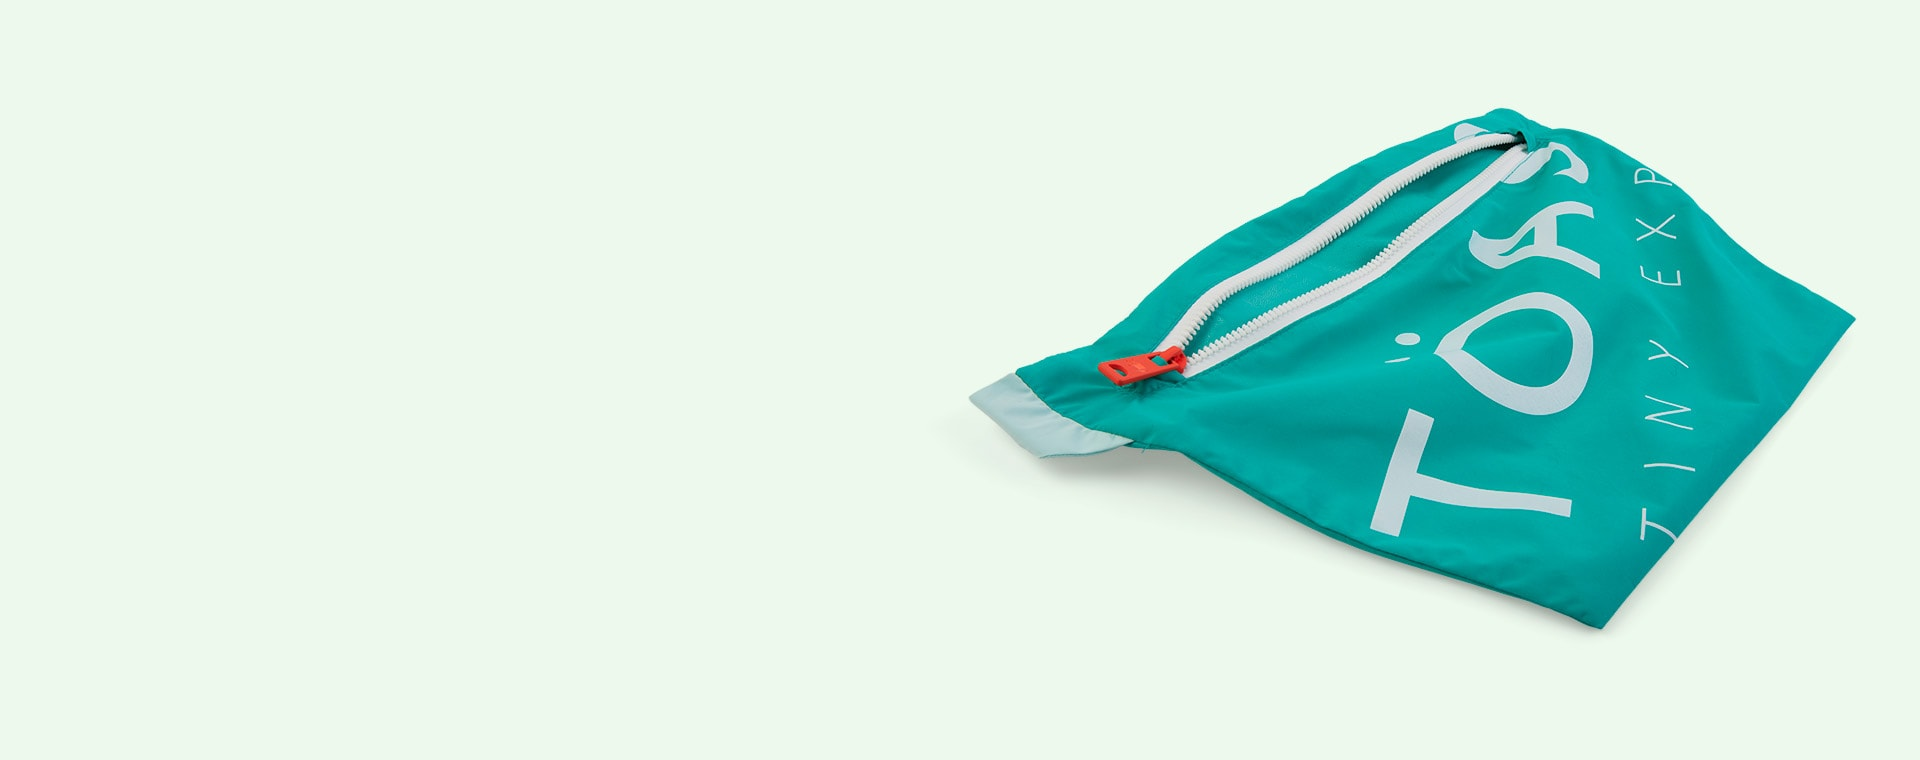 Emerald / Turquoise Töastie Kids FeatherLite Pac-a-Mac